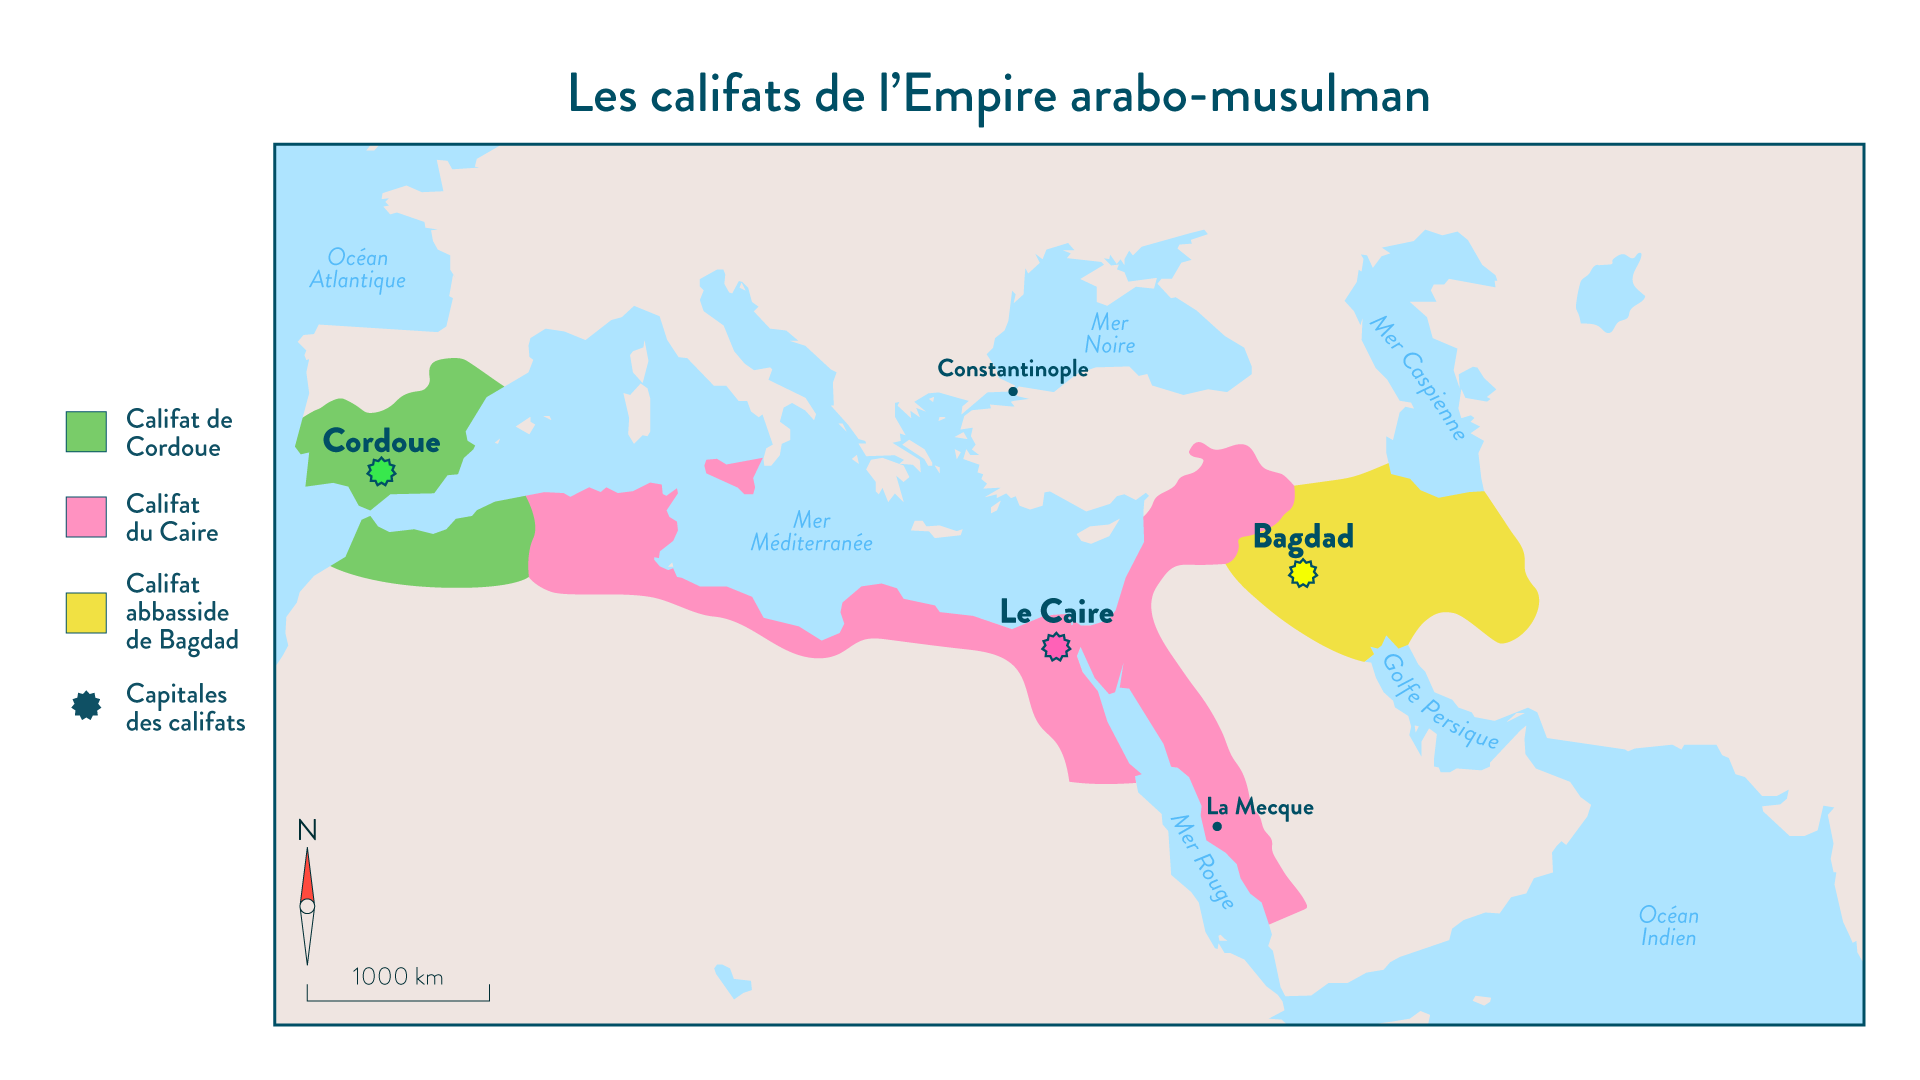 Les califats de lEmpire arabo-musulman au Xe siècle - 5e - Histoire